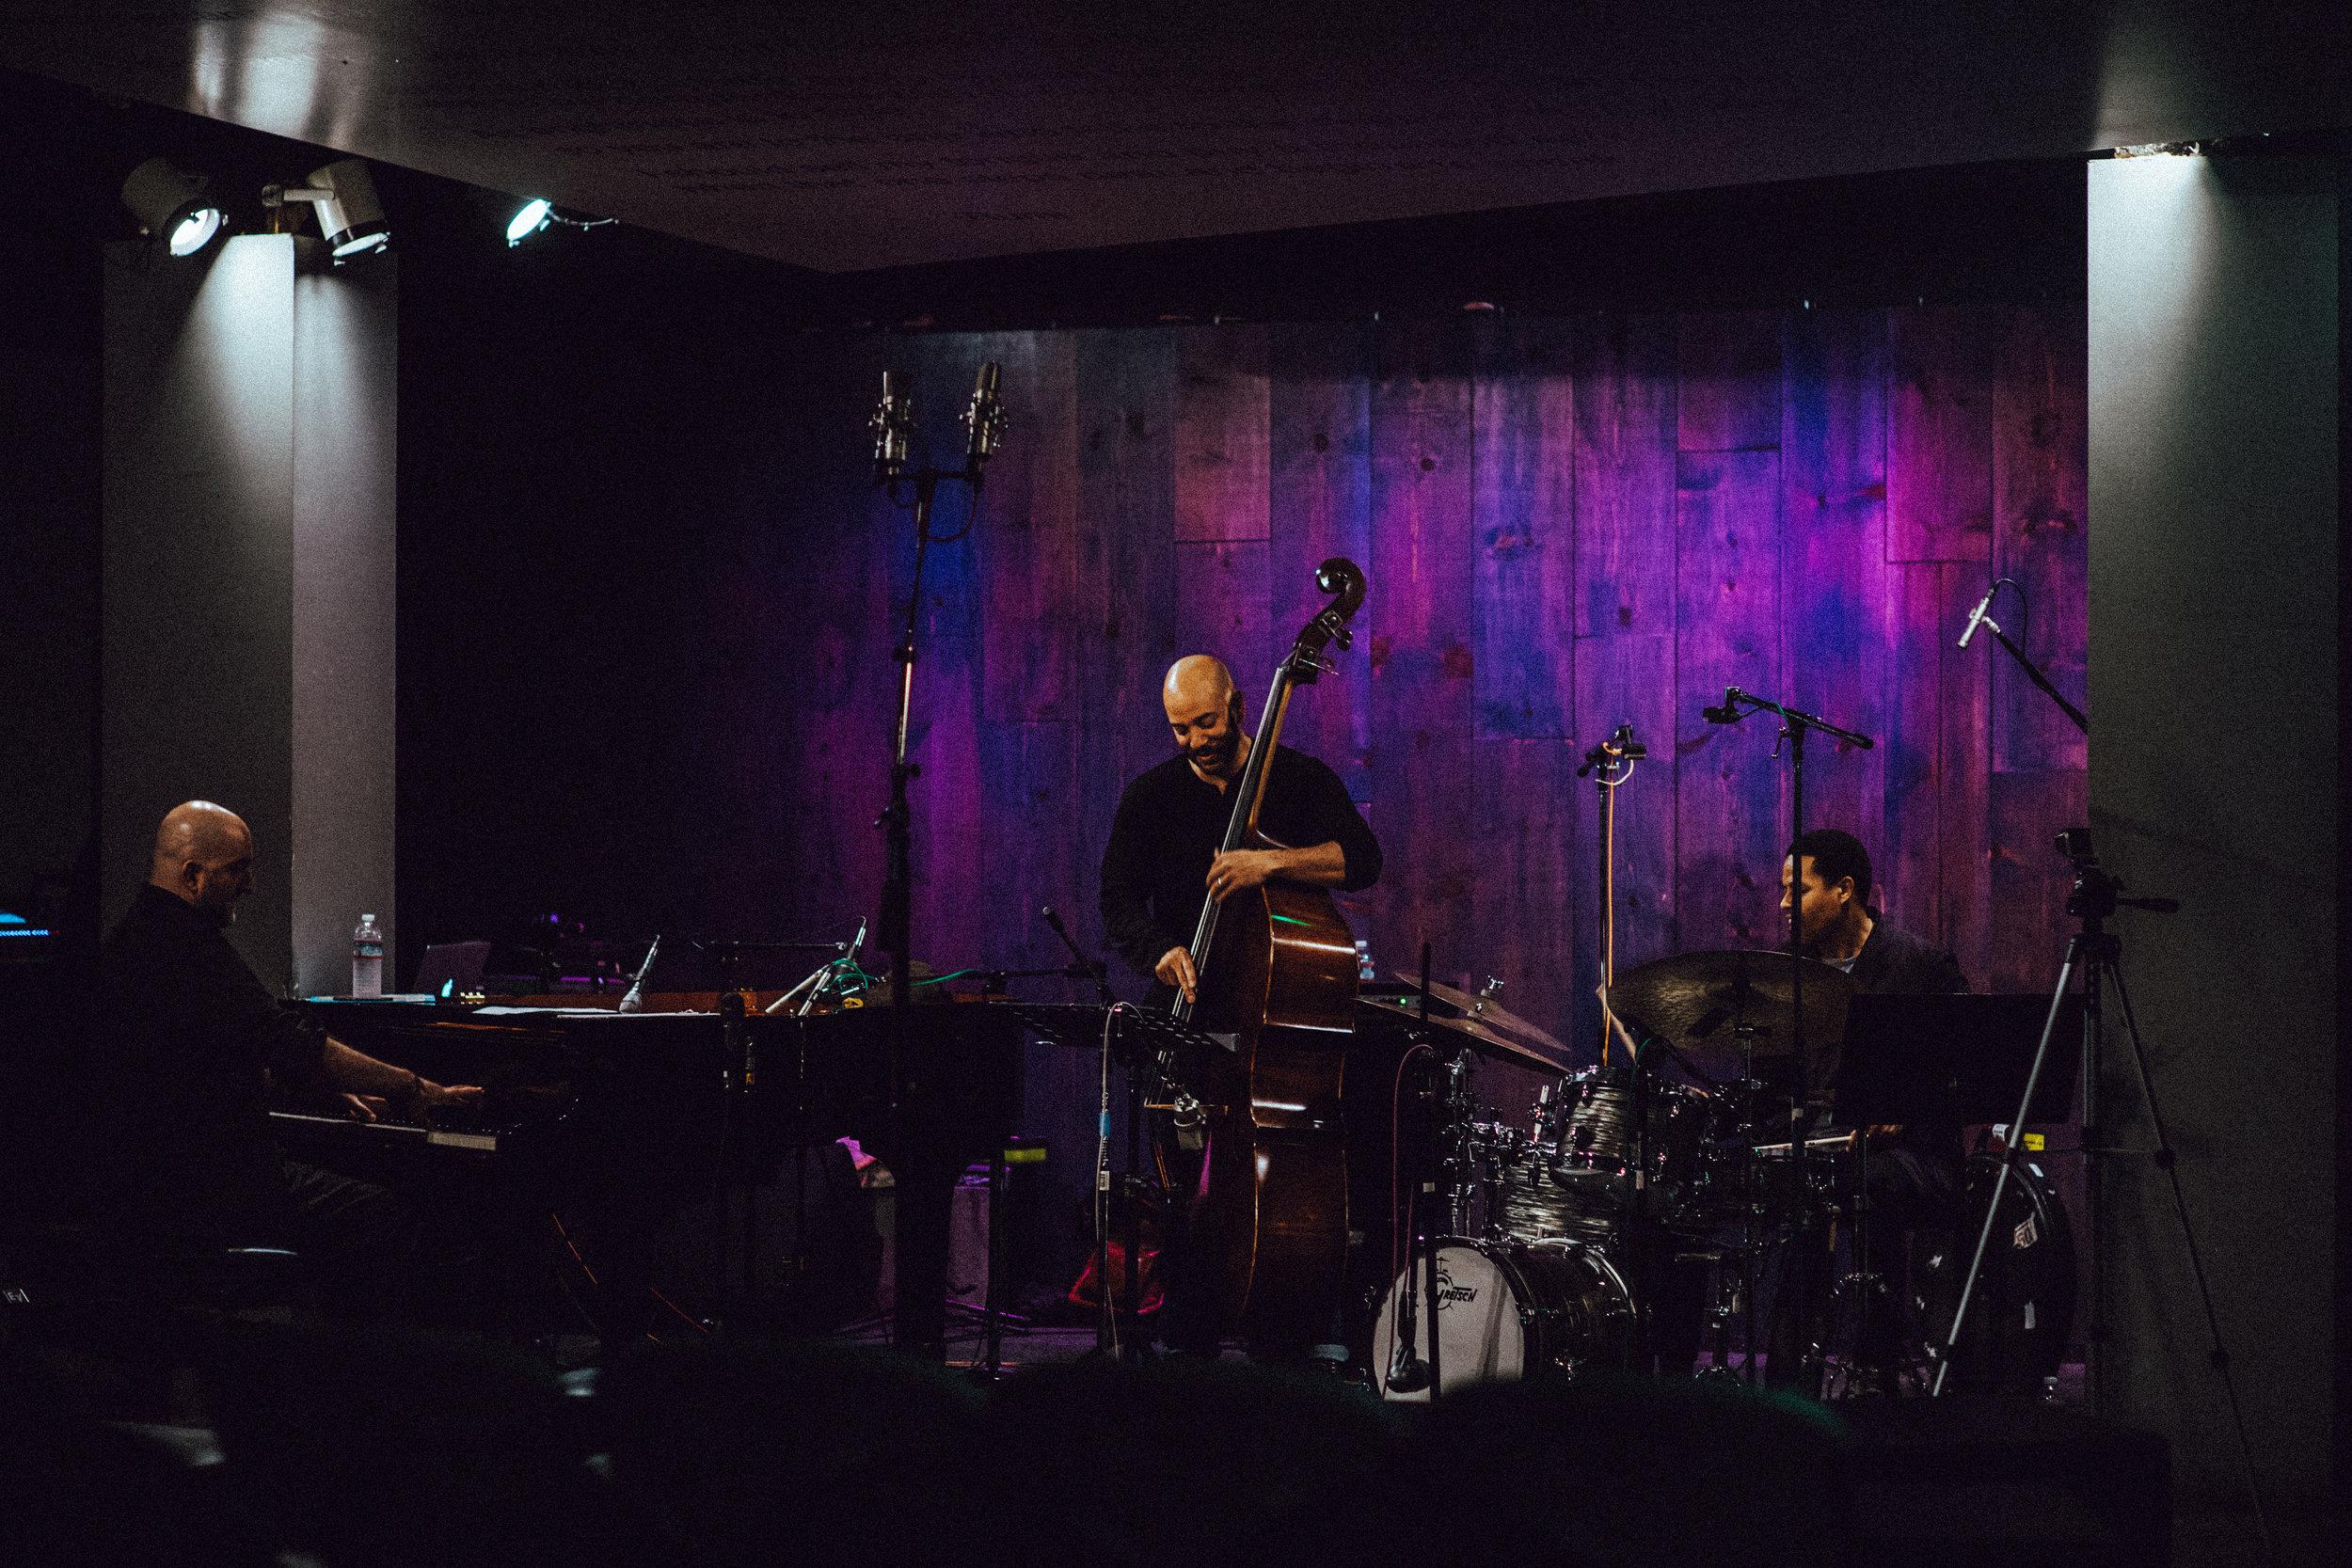 Armen Nalbandian Trio ~ Armen Nalbandian, Eric Revis, Nasheet Waits